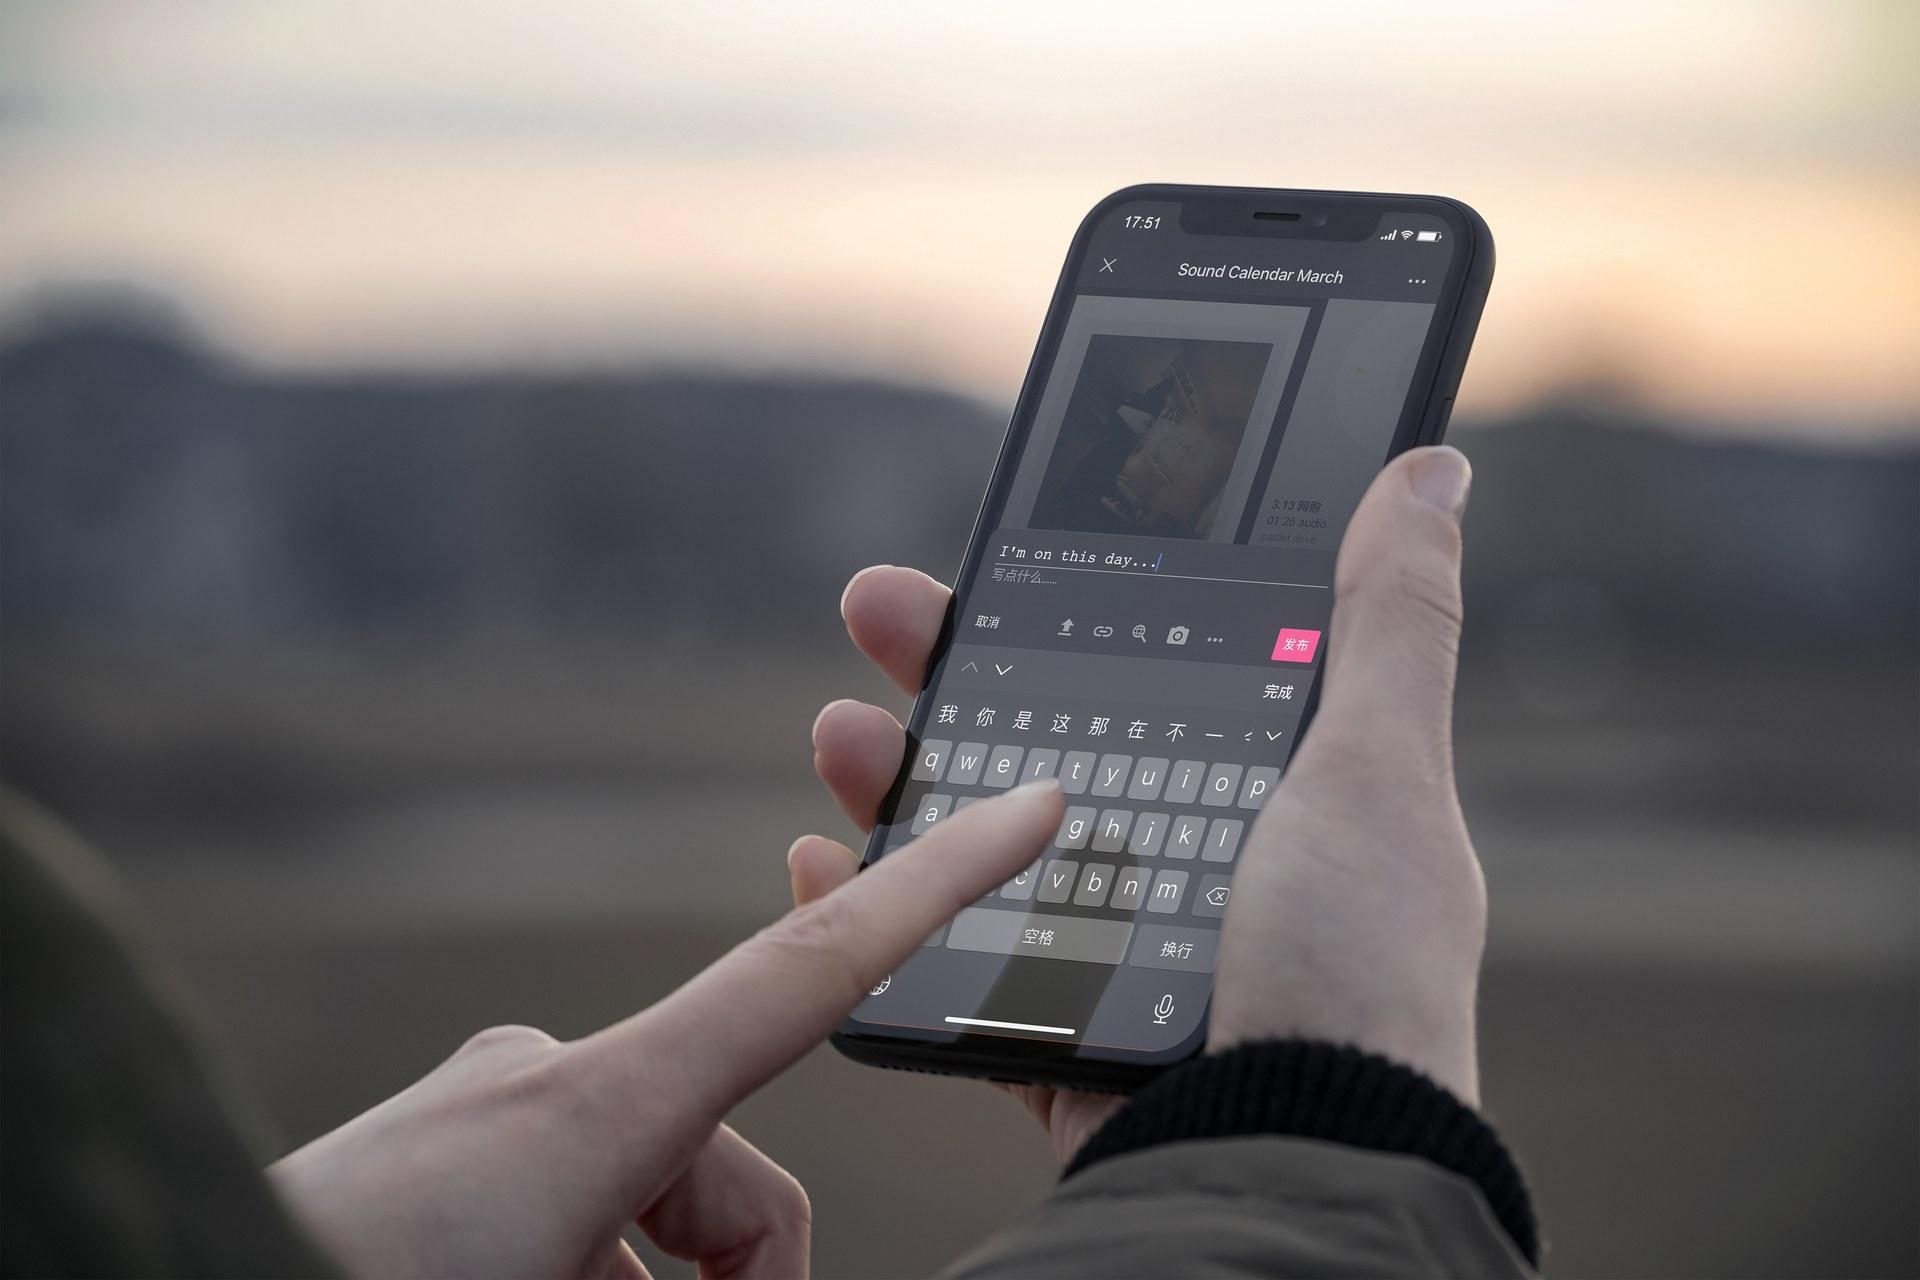 Phone application